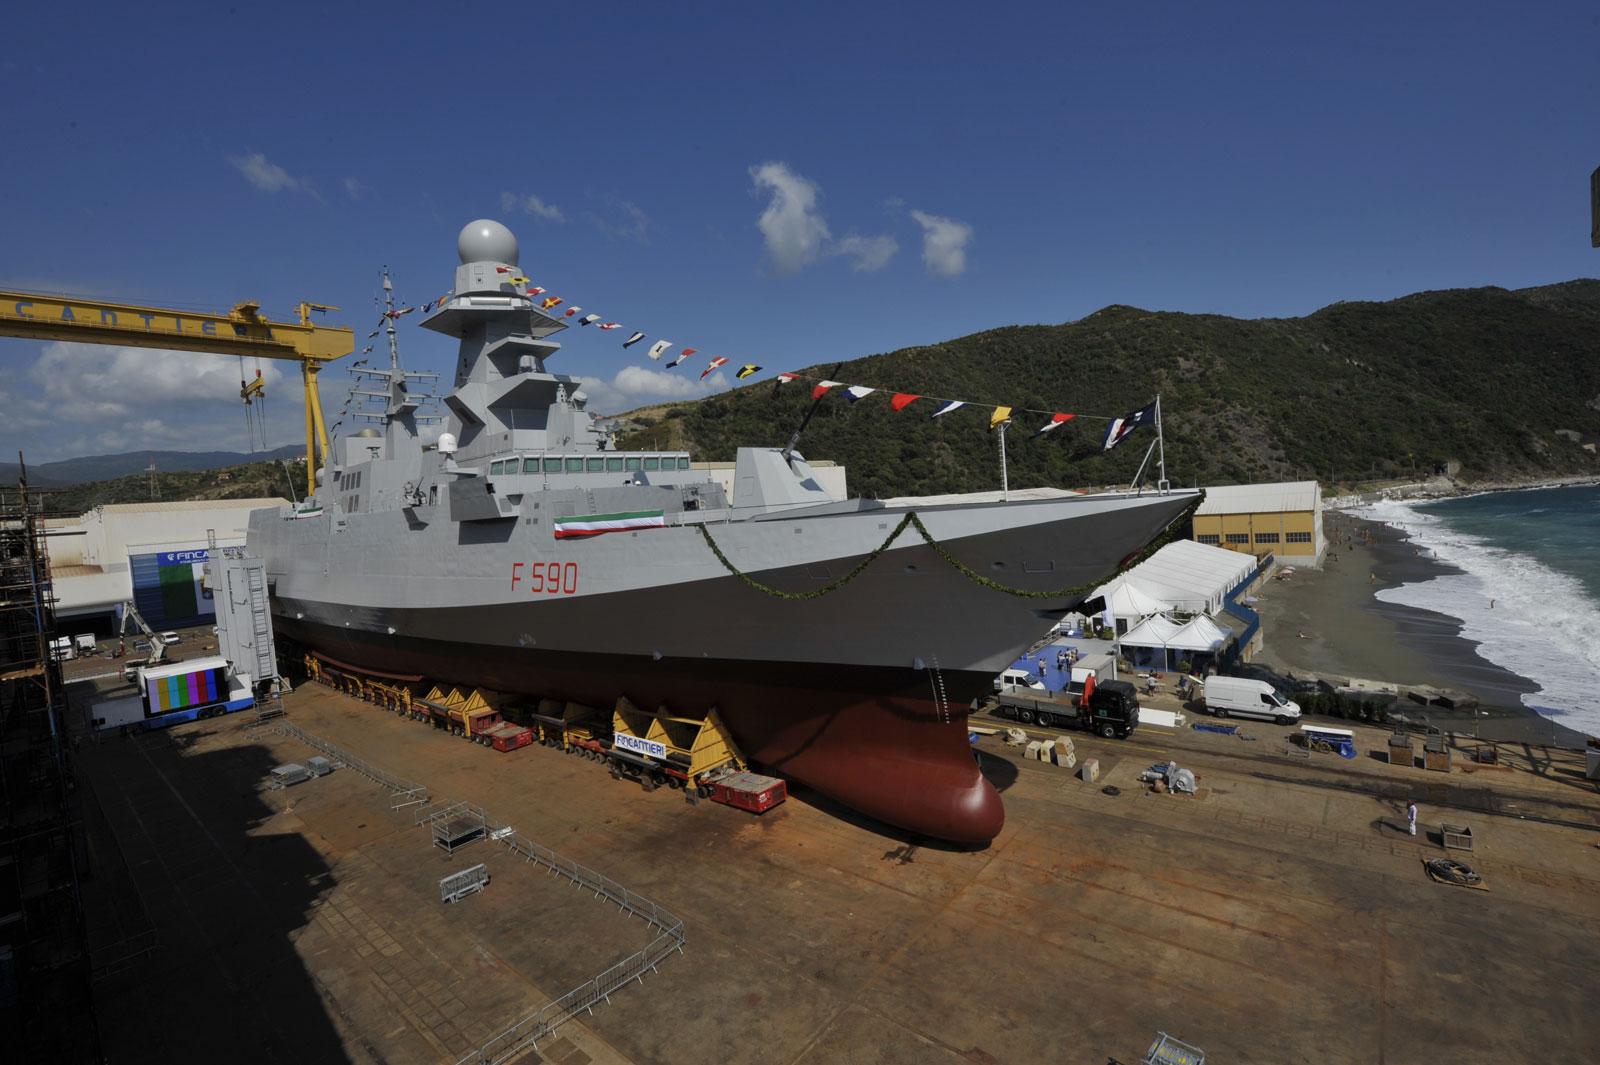 1111111111111111Lançamento-FREMM-Carlo-Bergamini-foto-3-Marinha-Italiana.jpg